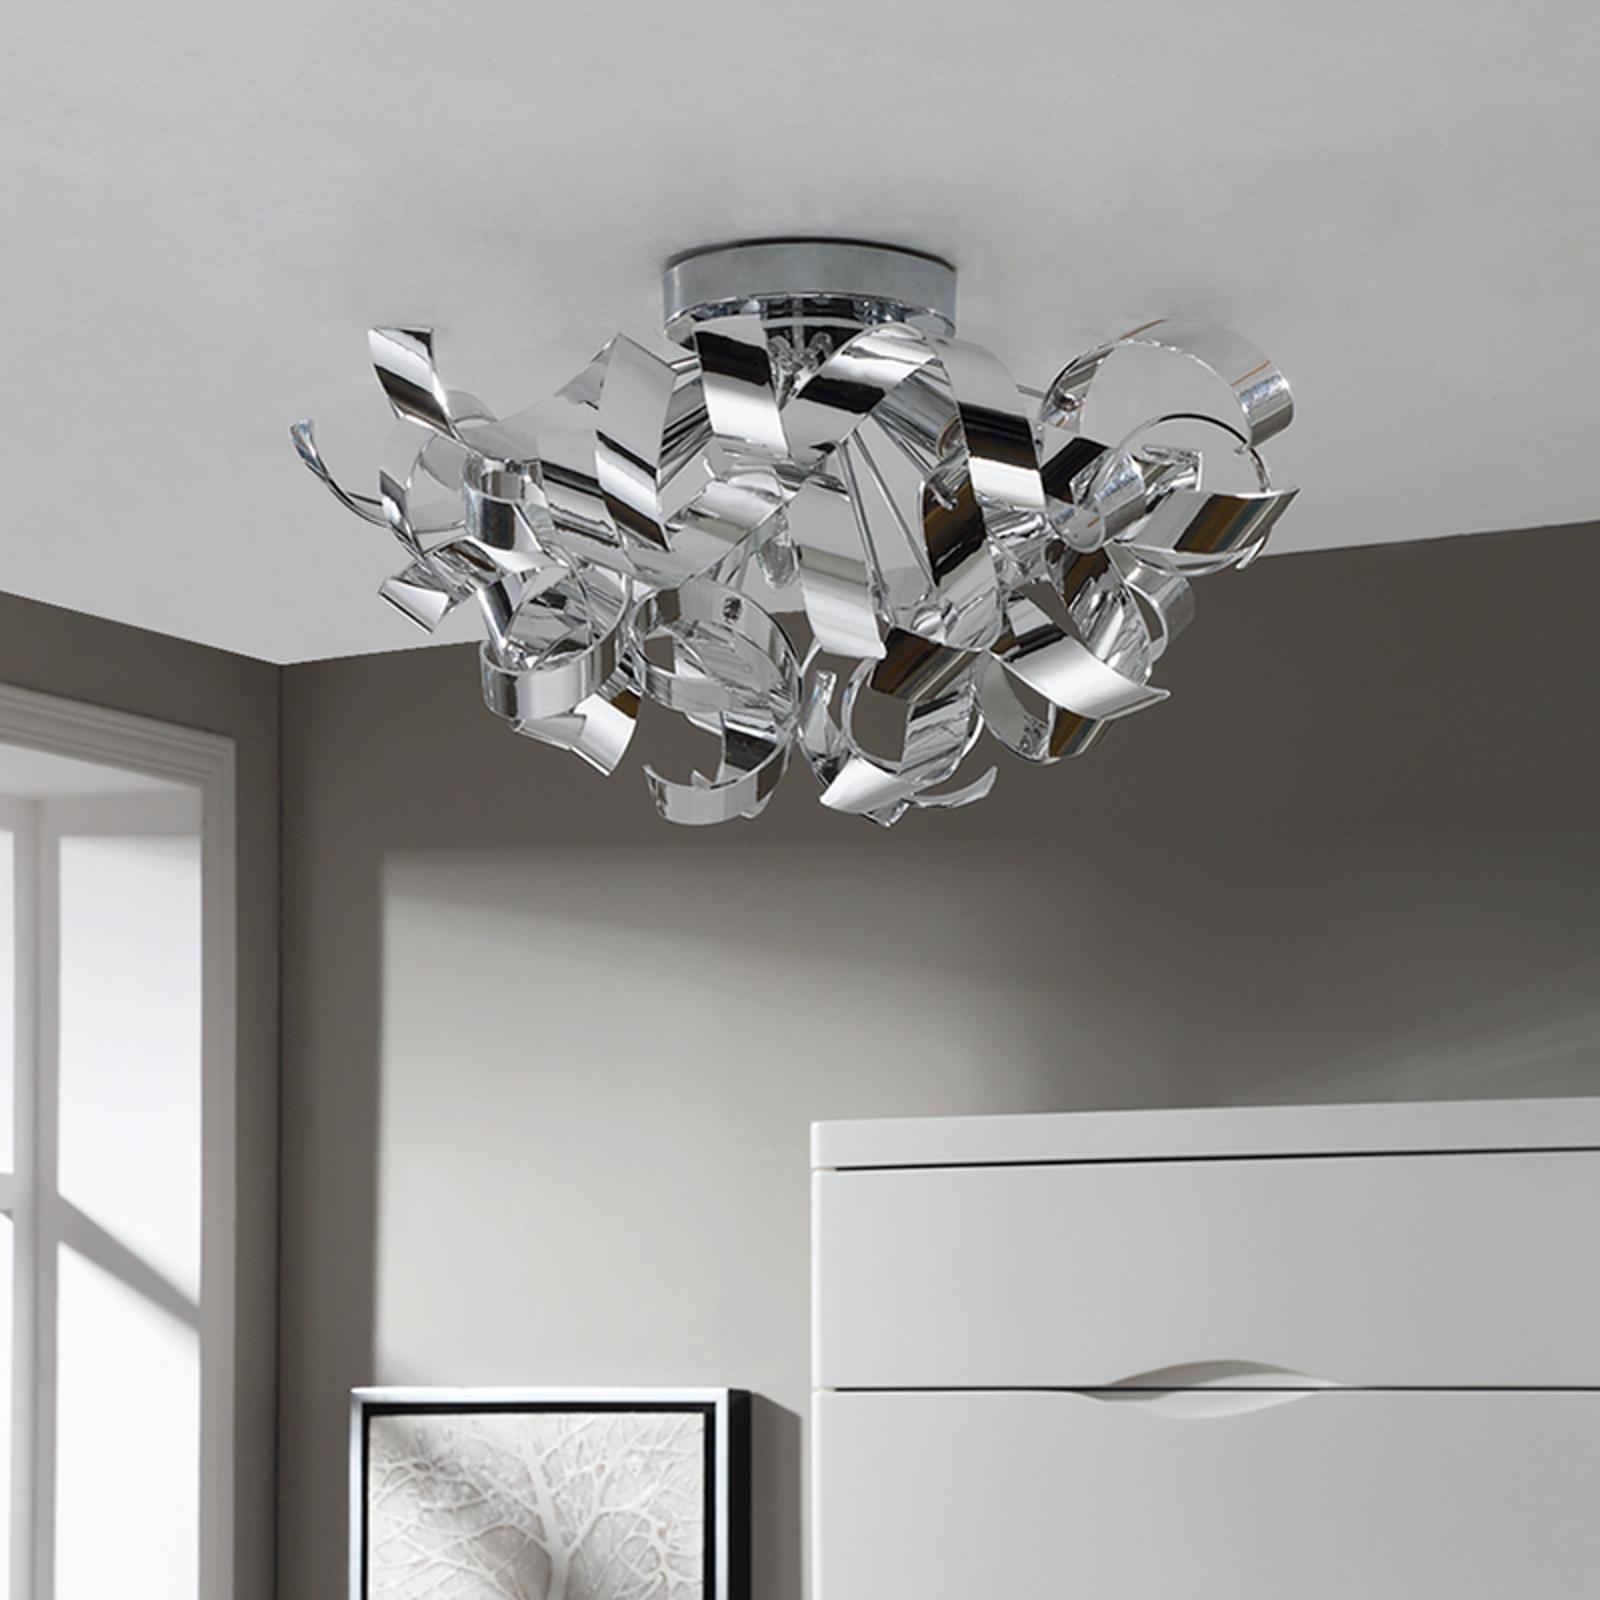 Plafonnier chromé décoratif Elviro